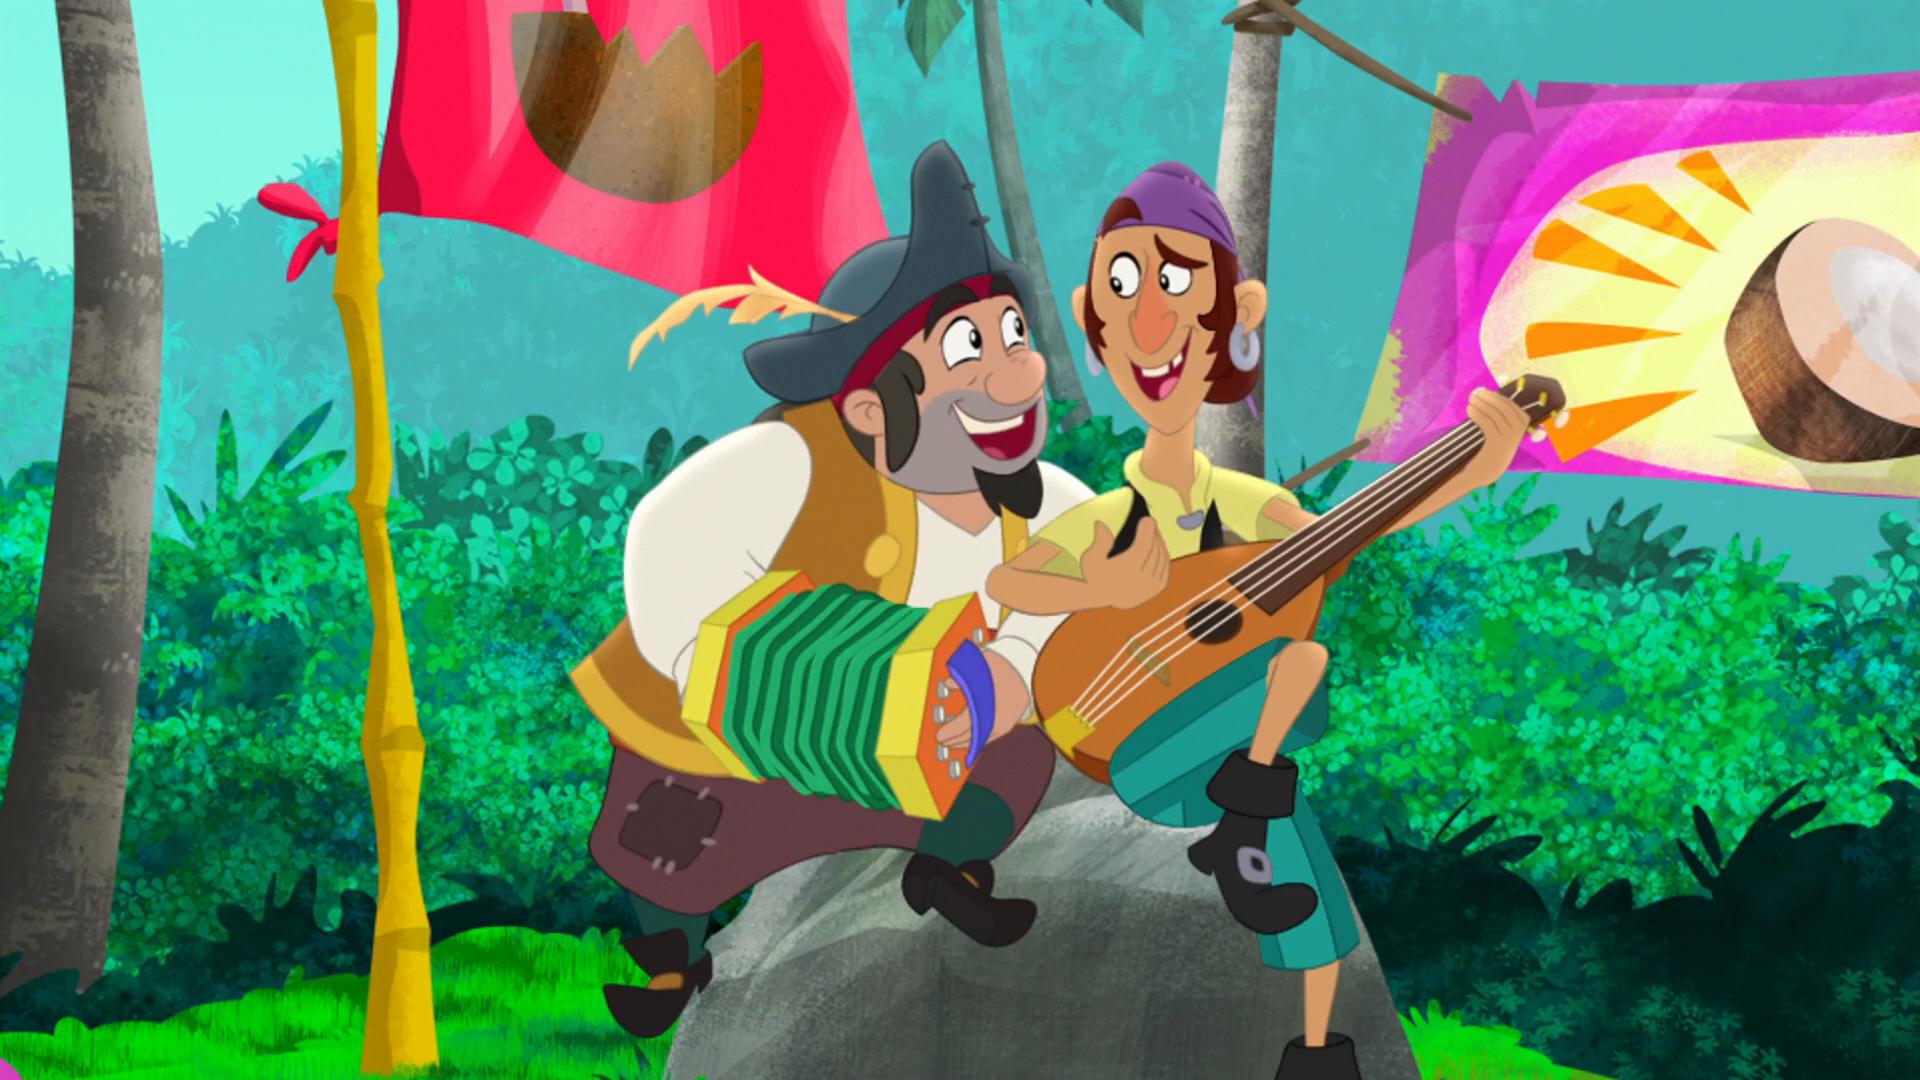 Accordion | Jake and the Never Land Pirates Wiki | FANDOM